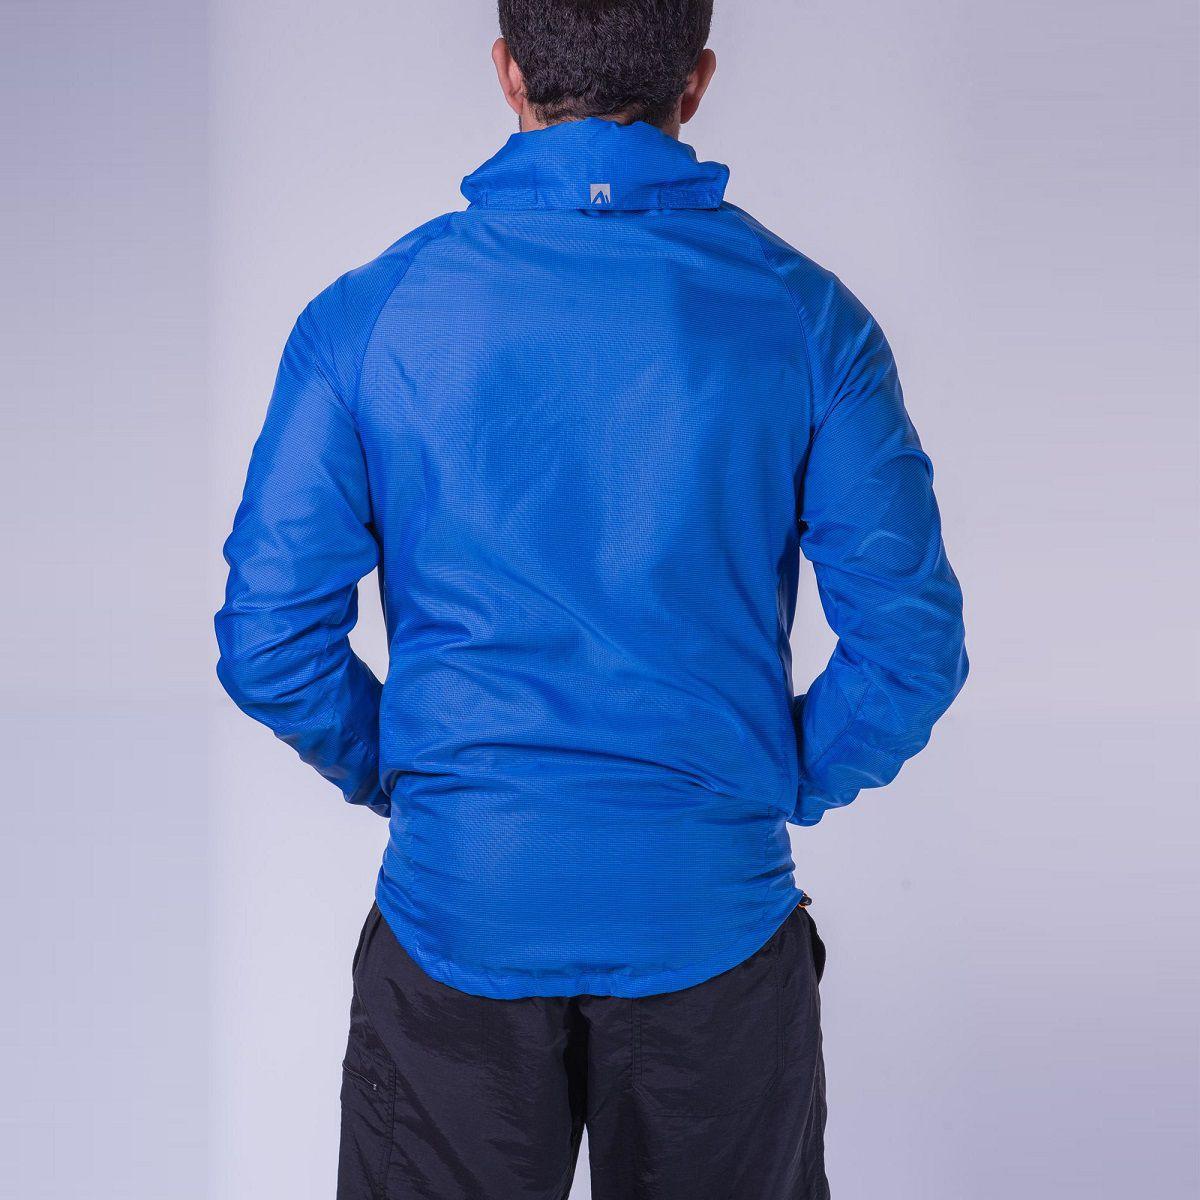 Jaqueta Corta Vento Masculina Hard wind - Azul Royal